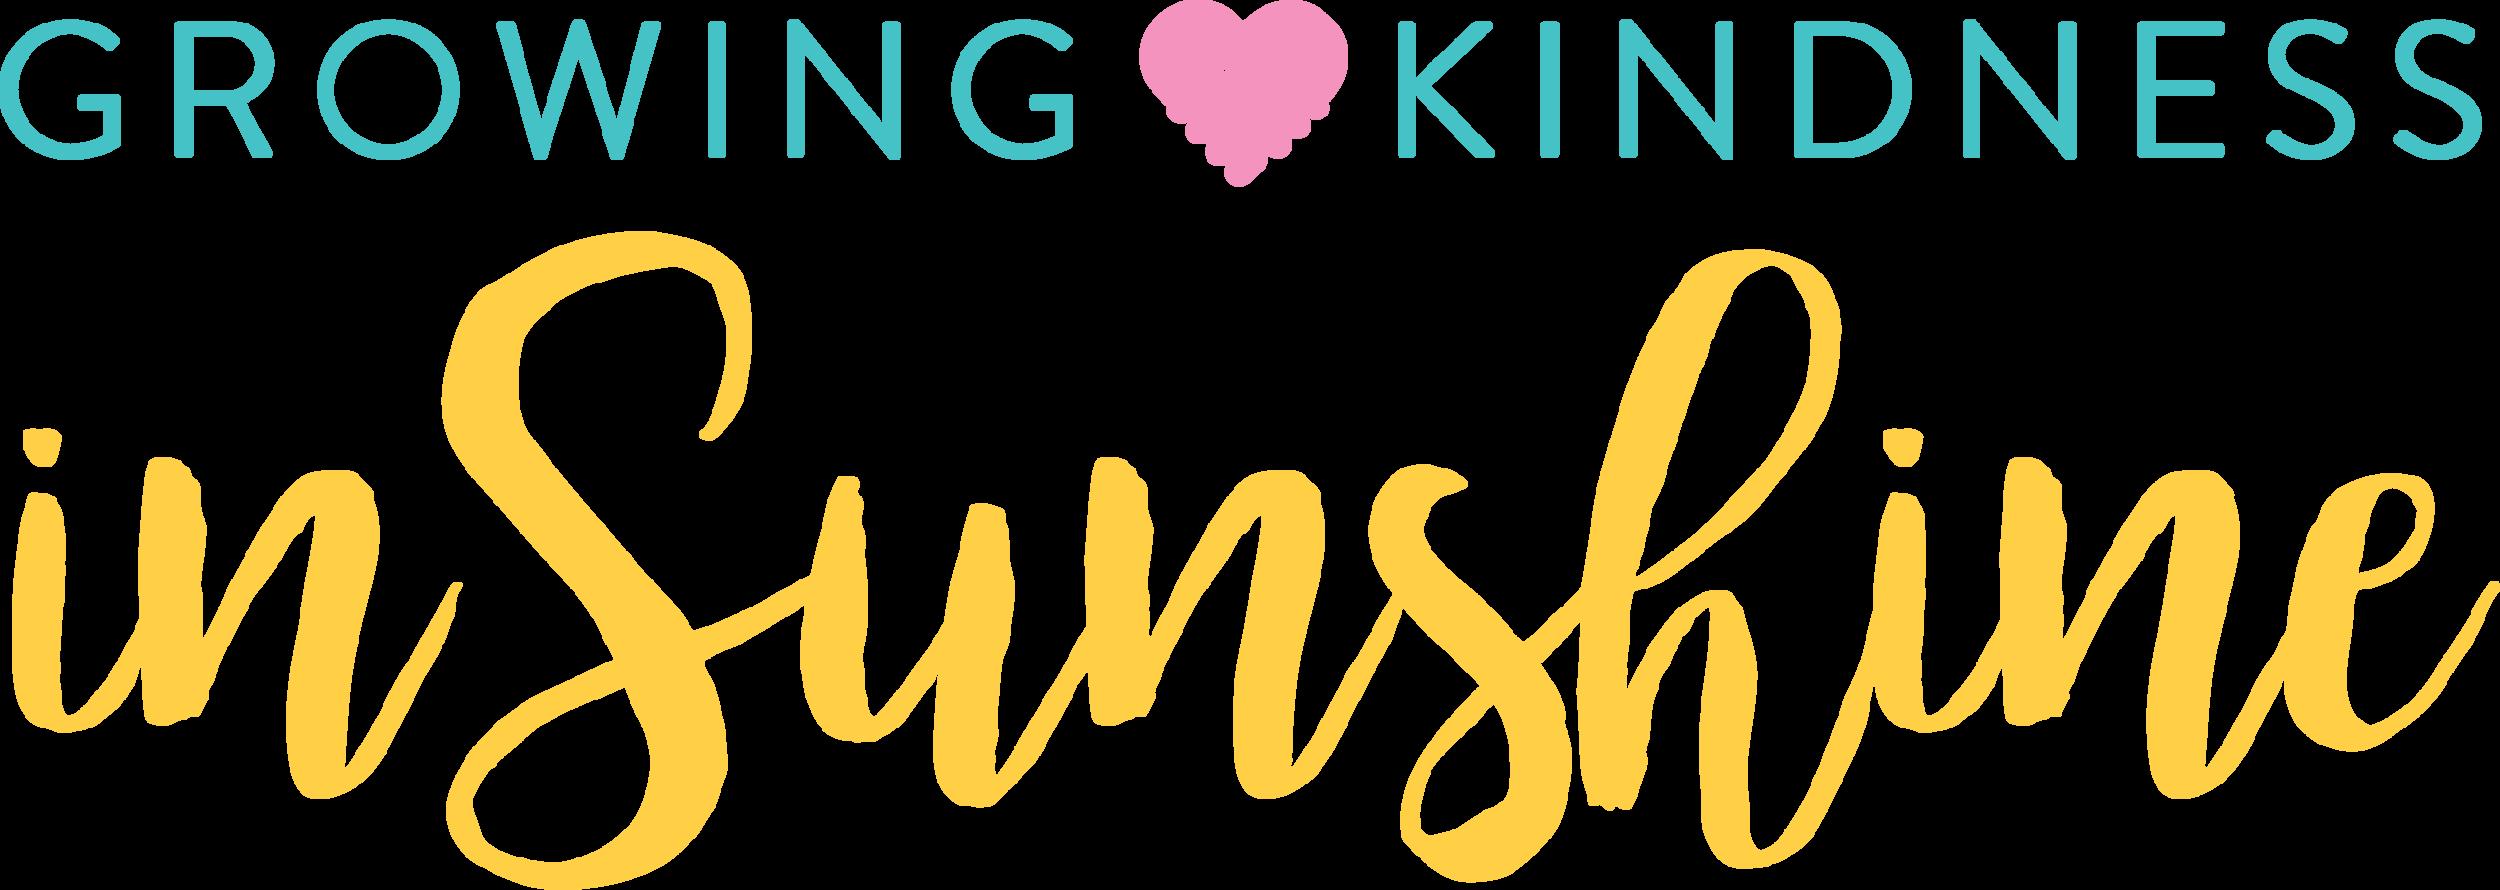 GrowingKindness_inSunshine_Logo_MultiColor.png